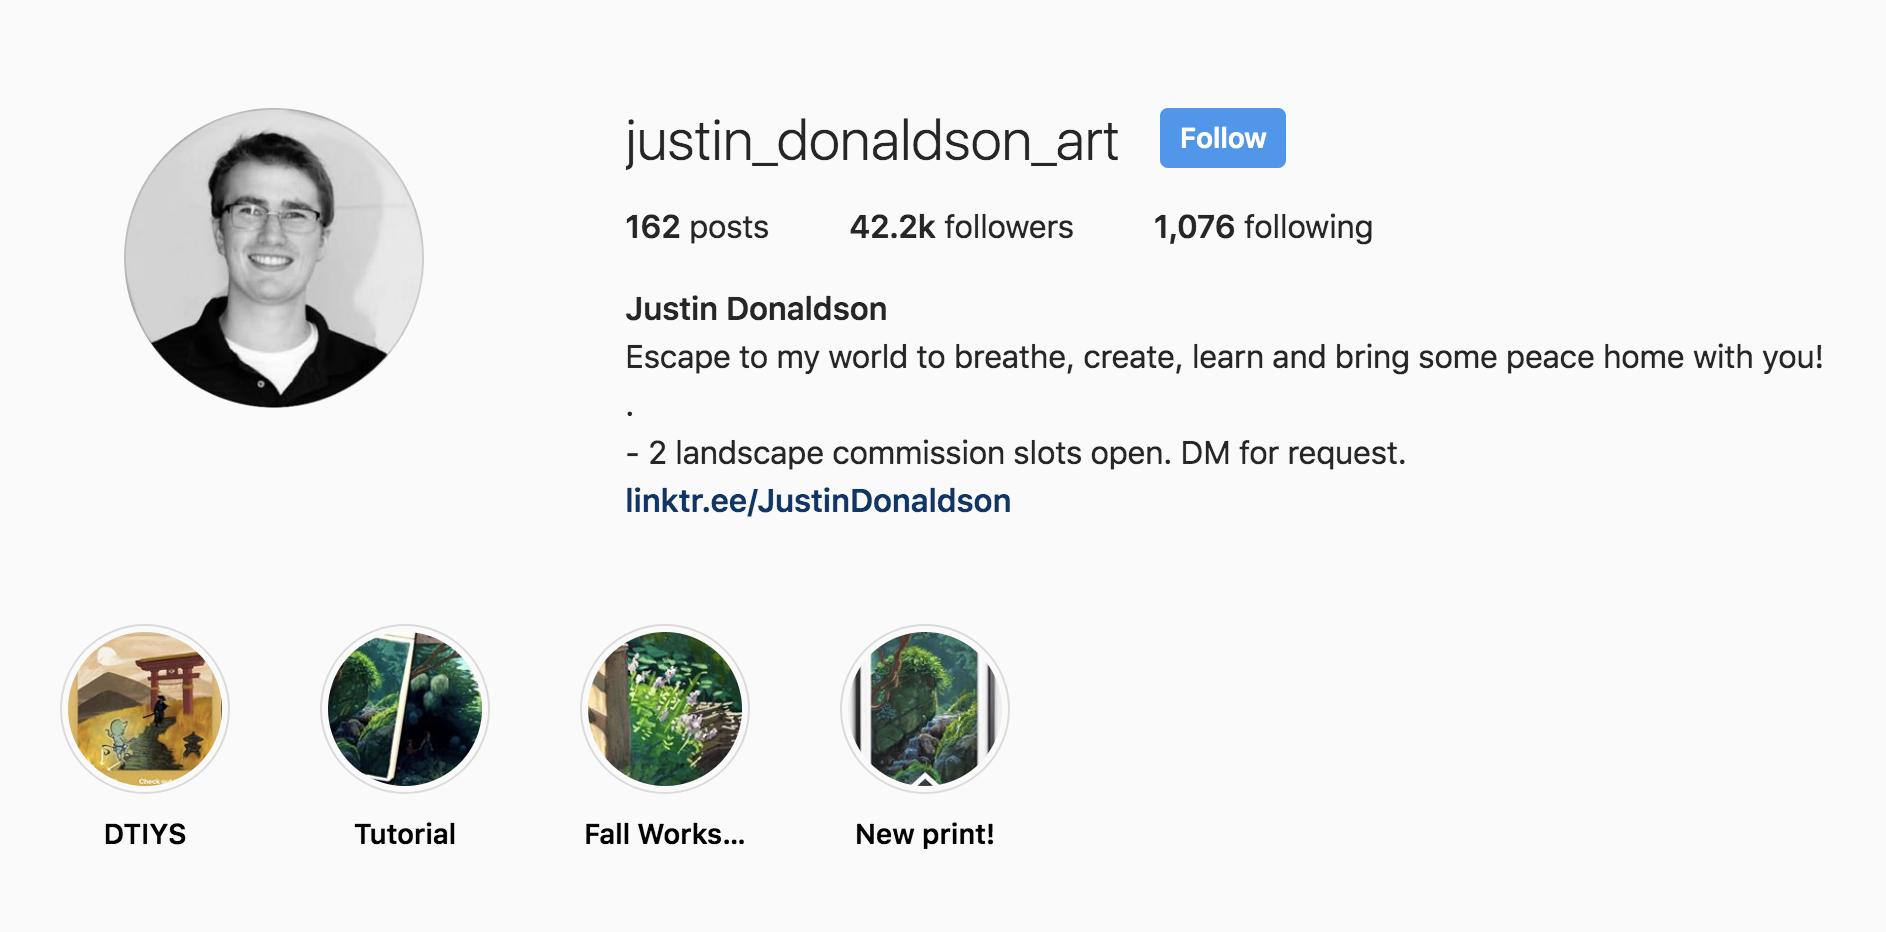 instagram-justin-donaldson-art.png